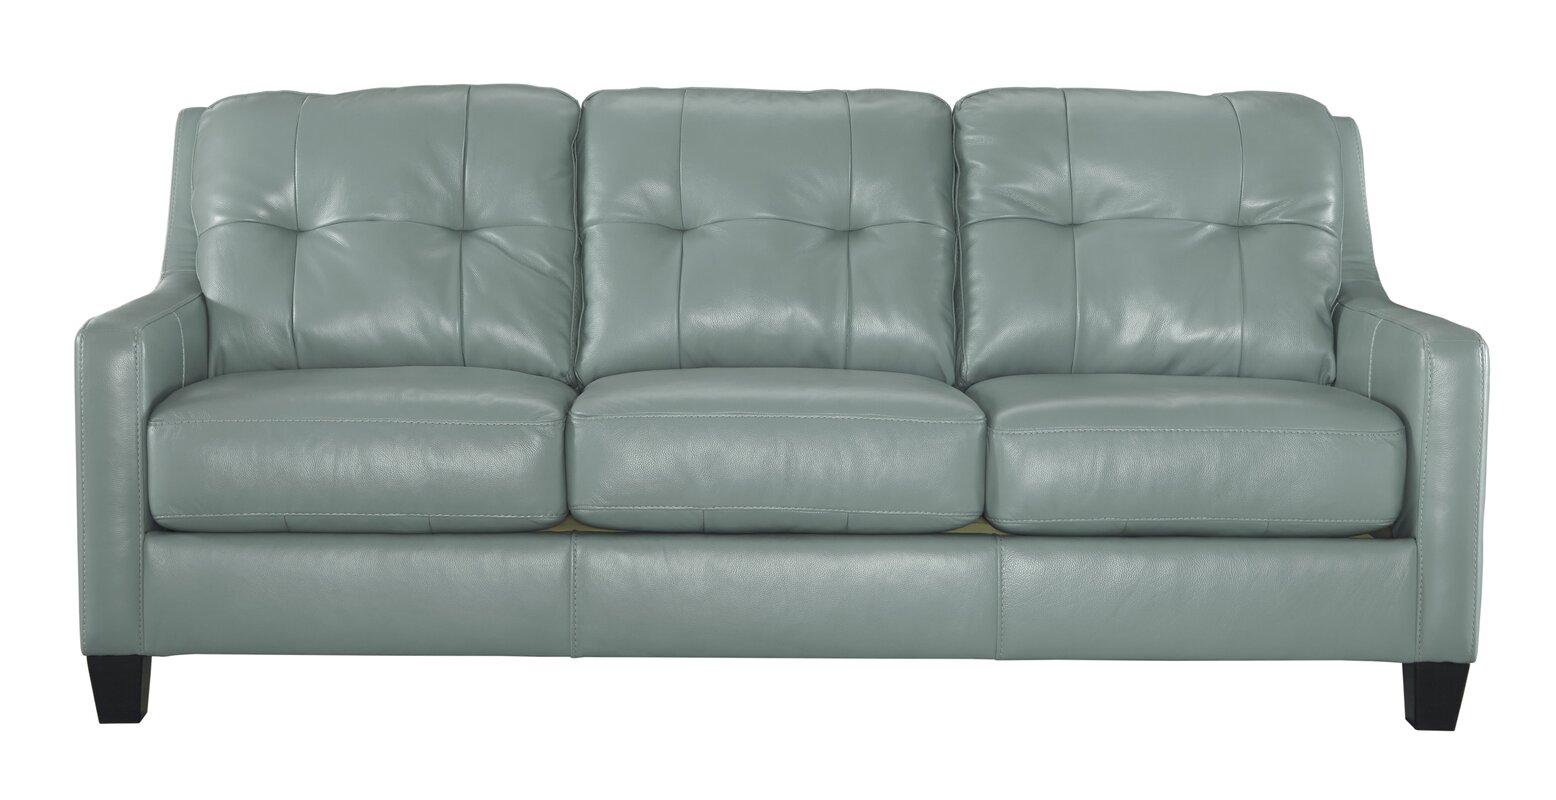 Modern brown leather sofa - Modern Brown Leather Sofa 23